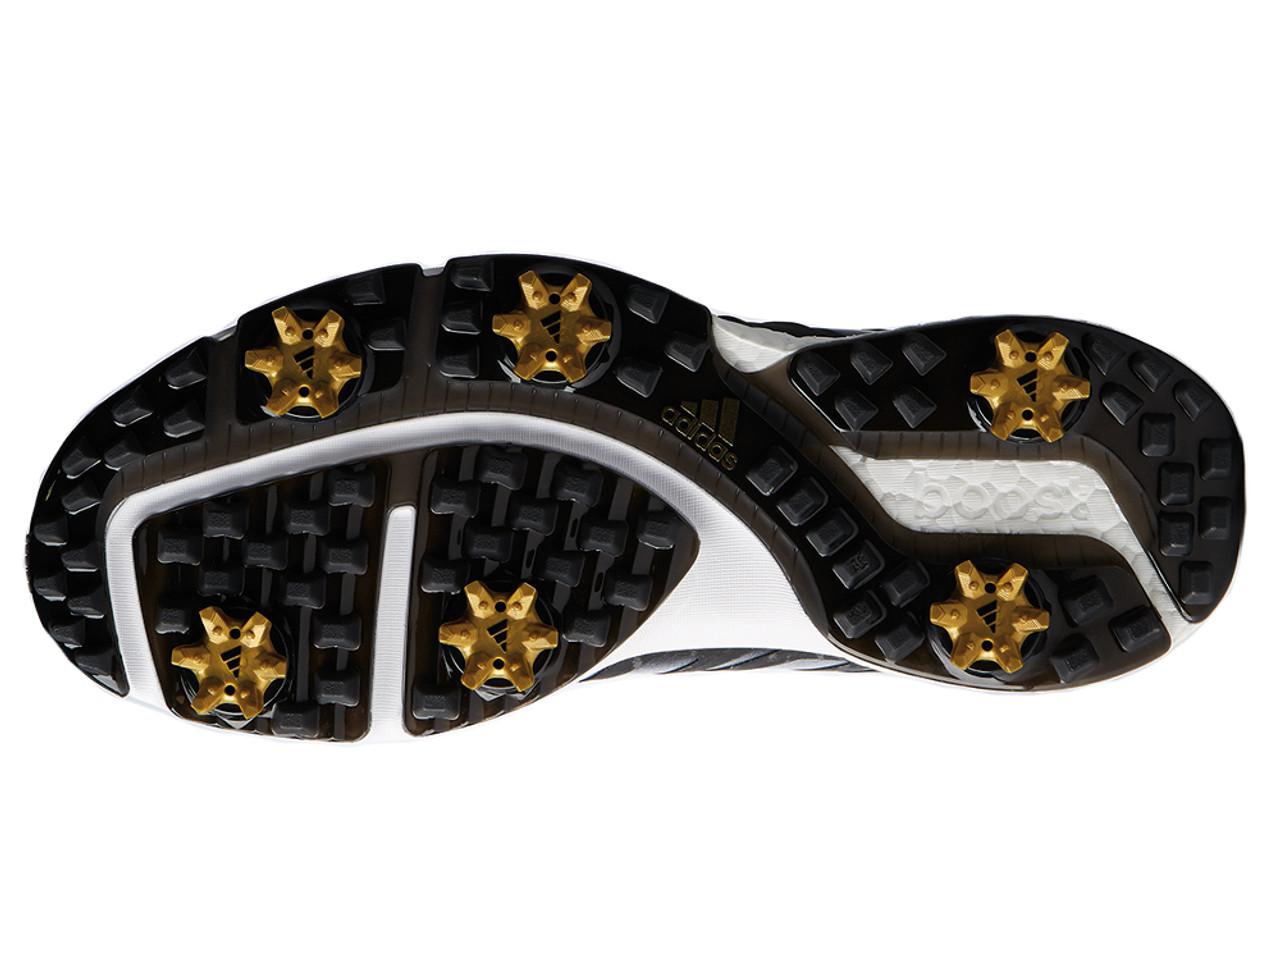 wholesale dealer 99157 7c53c Adidas Powerband BOA Boost Golf Shoes - Core BlackGold Met.